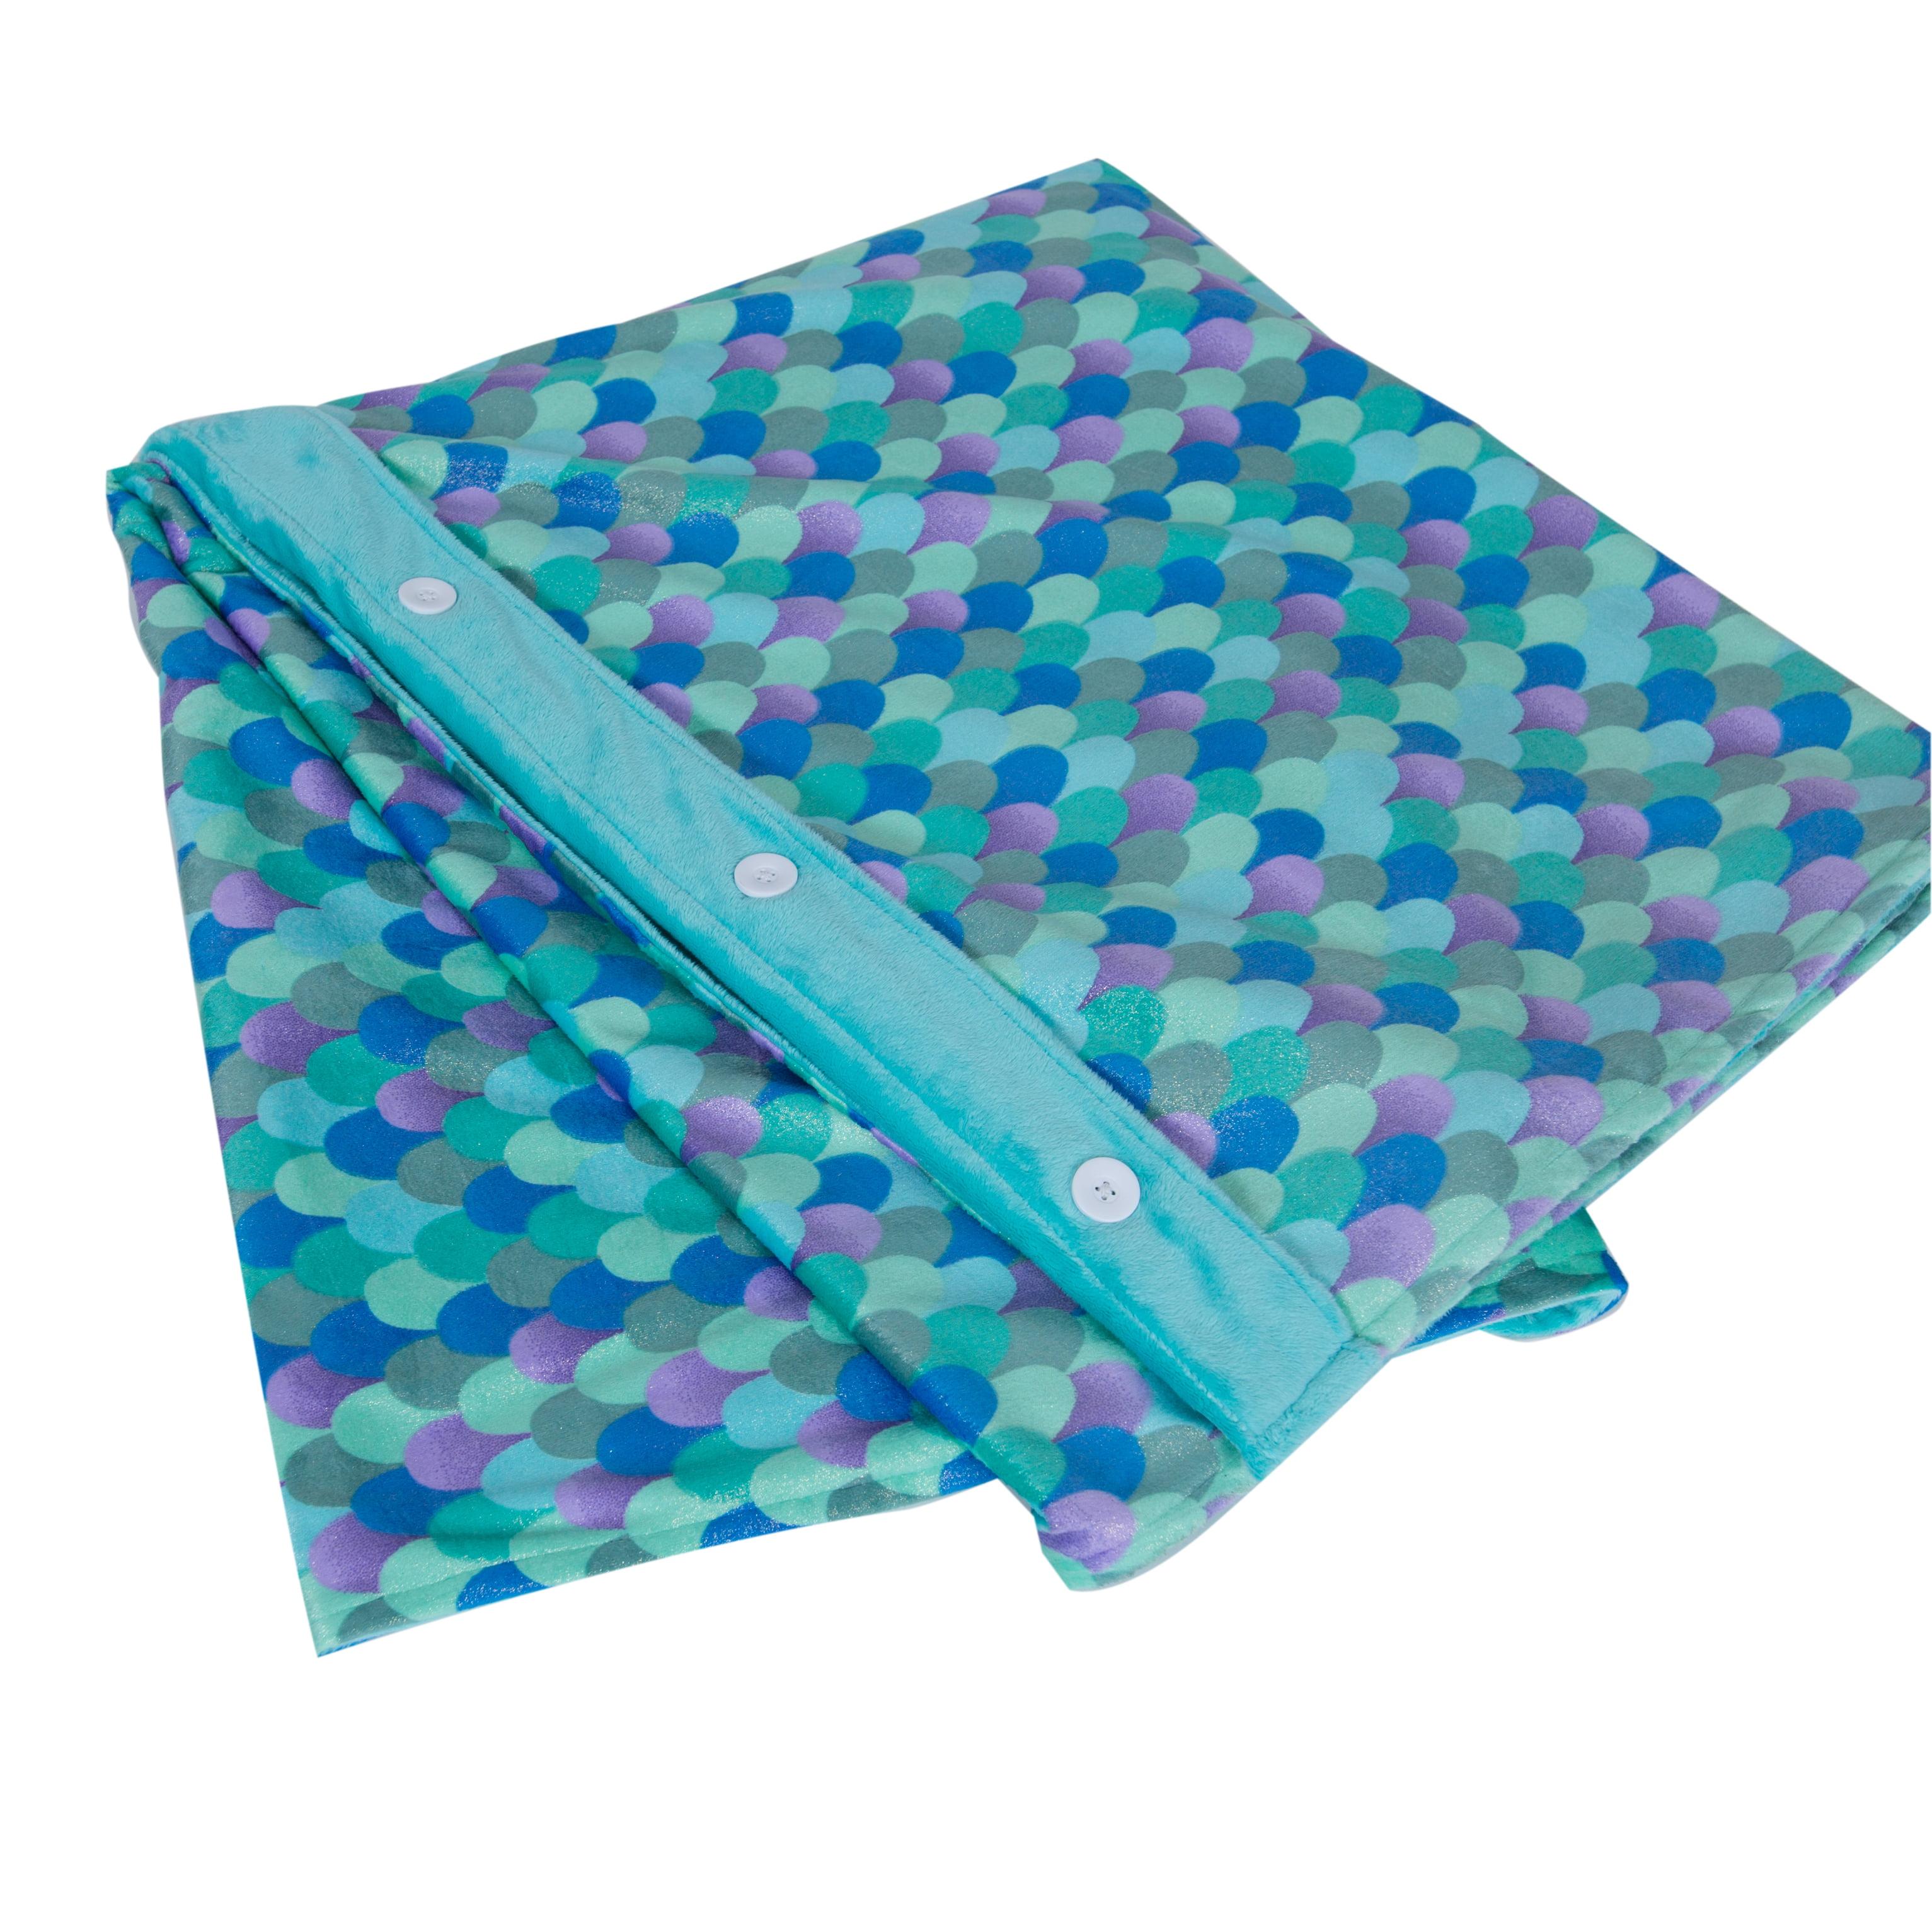 Poly Fil 6 Pound Weighted Blanket Insert Just Add Fabric 36 X 48 Walmart Com Walmart Com